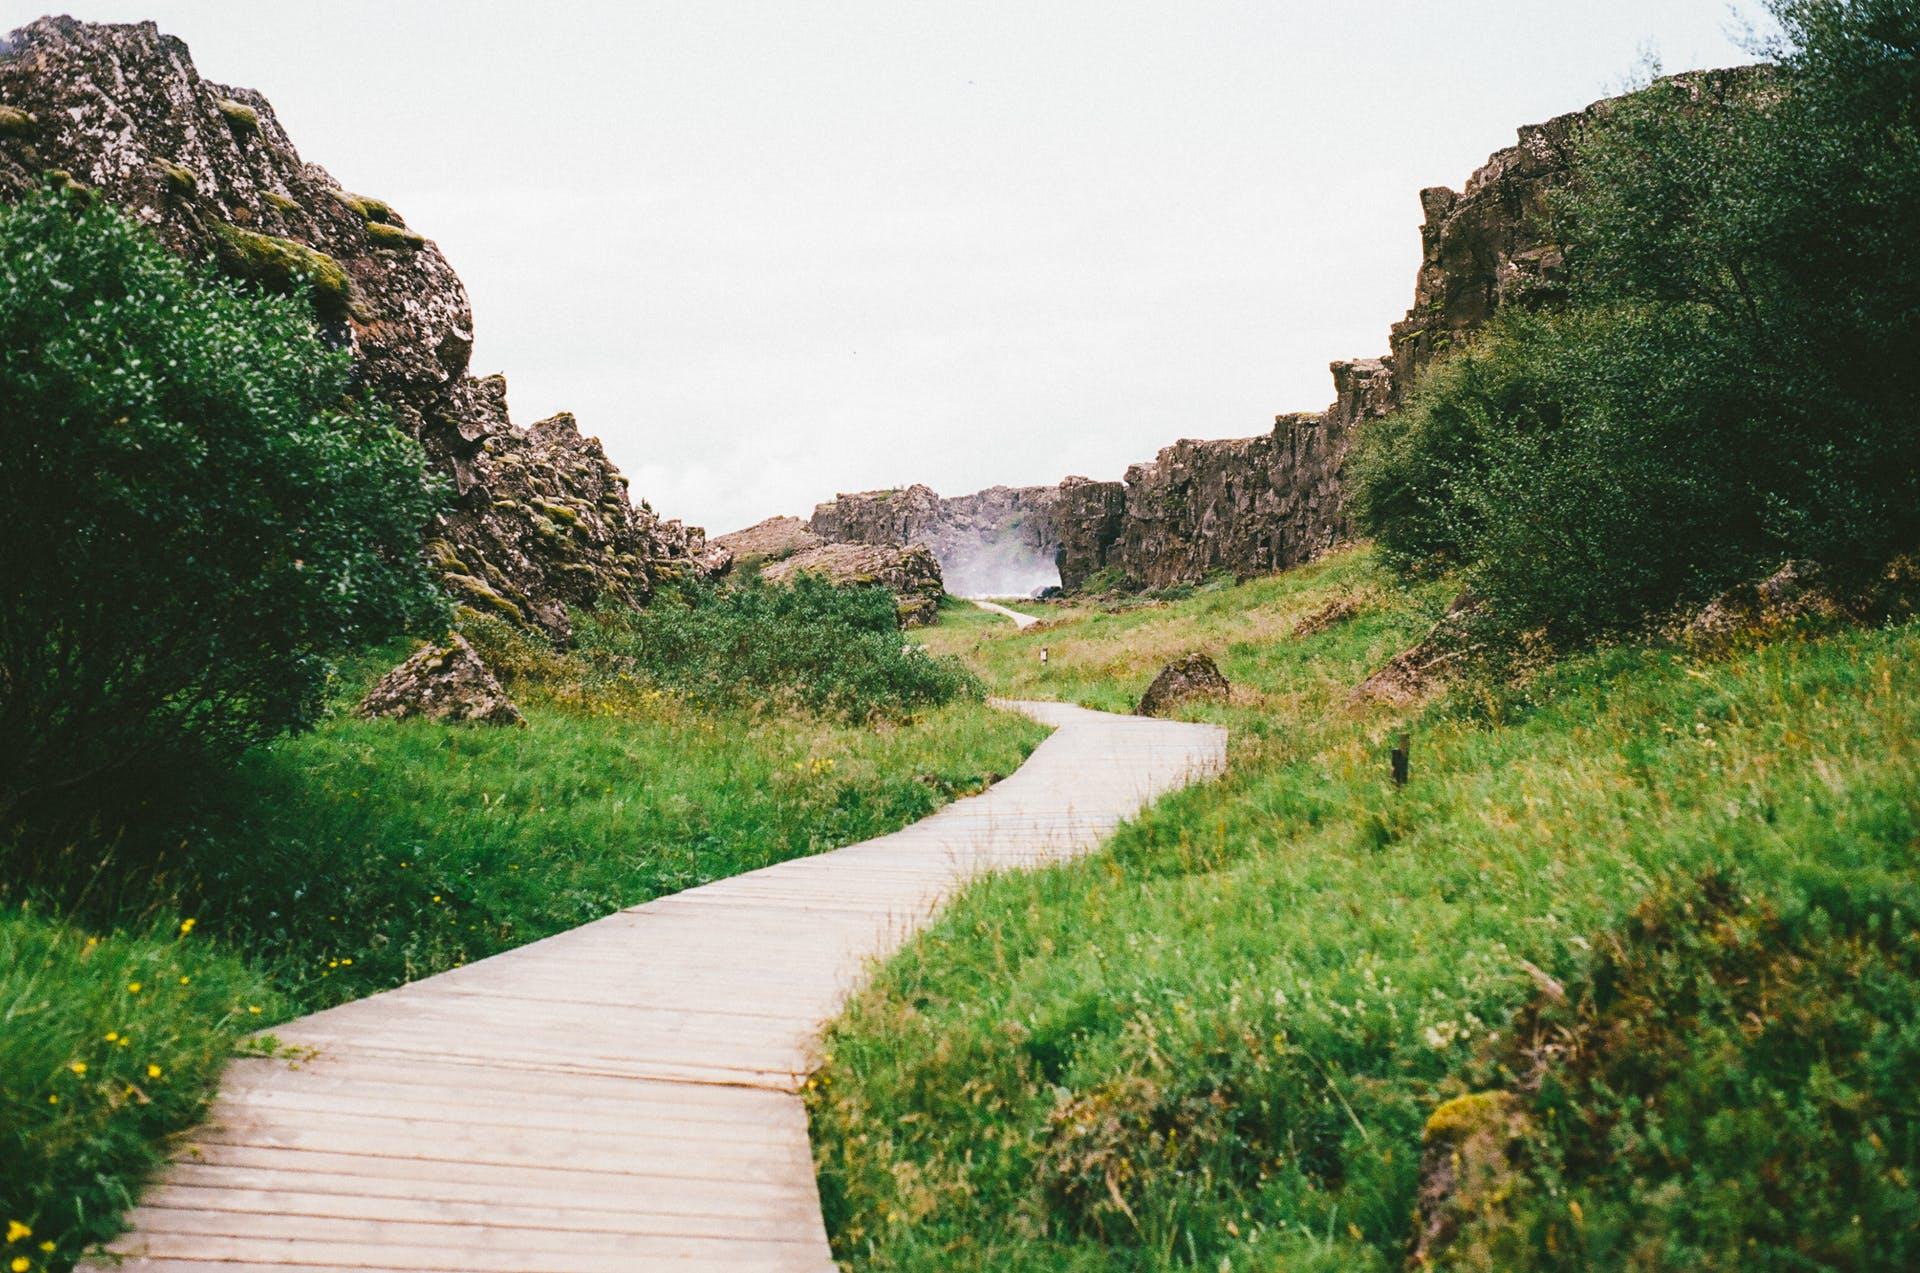 hiking, path, pathway